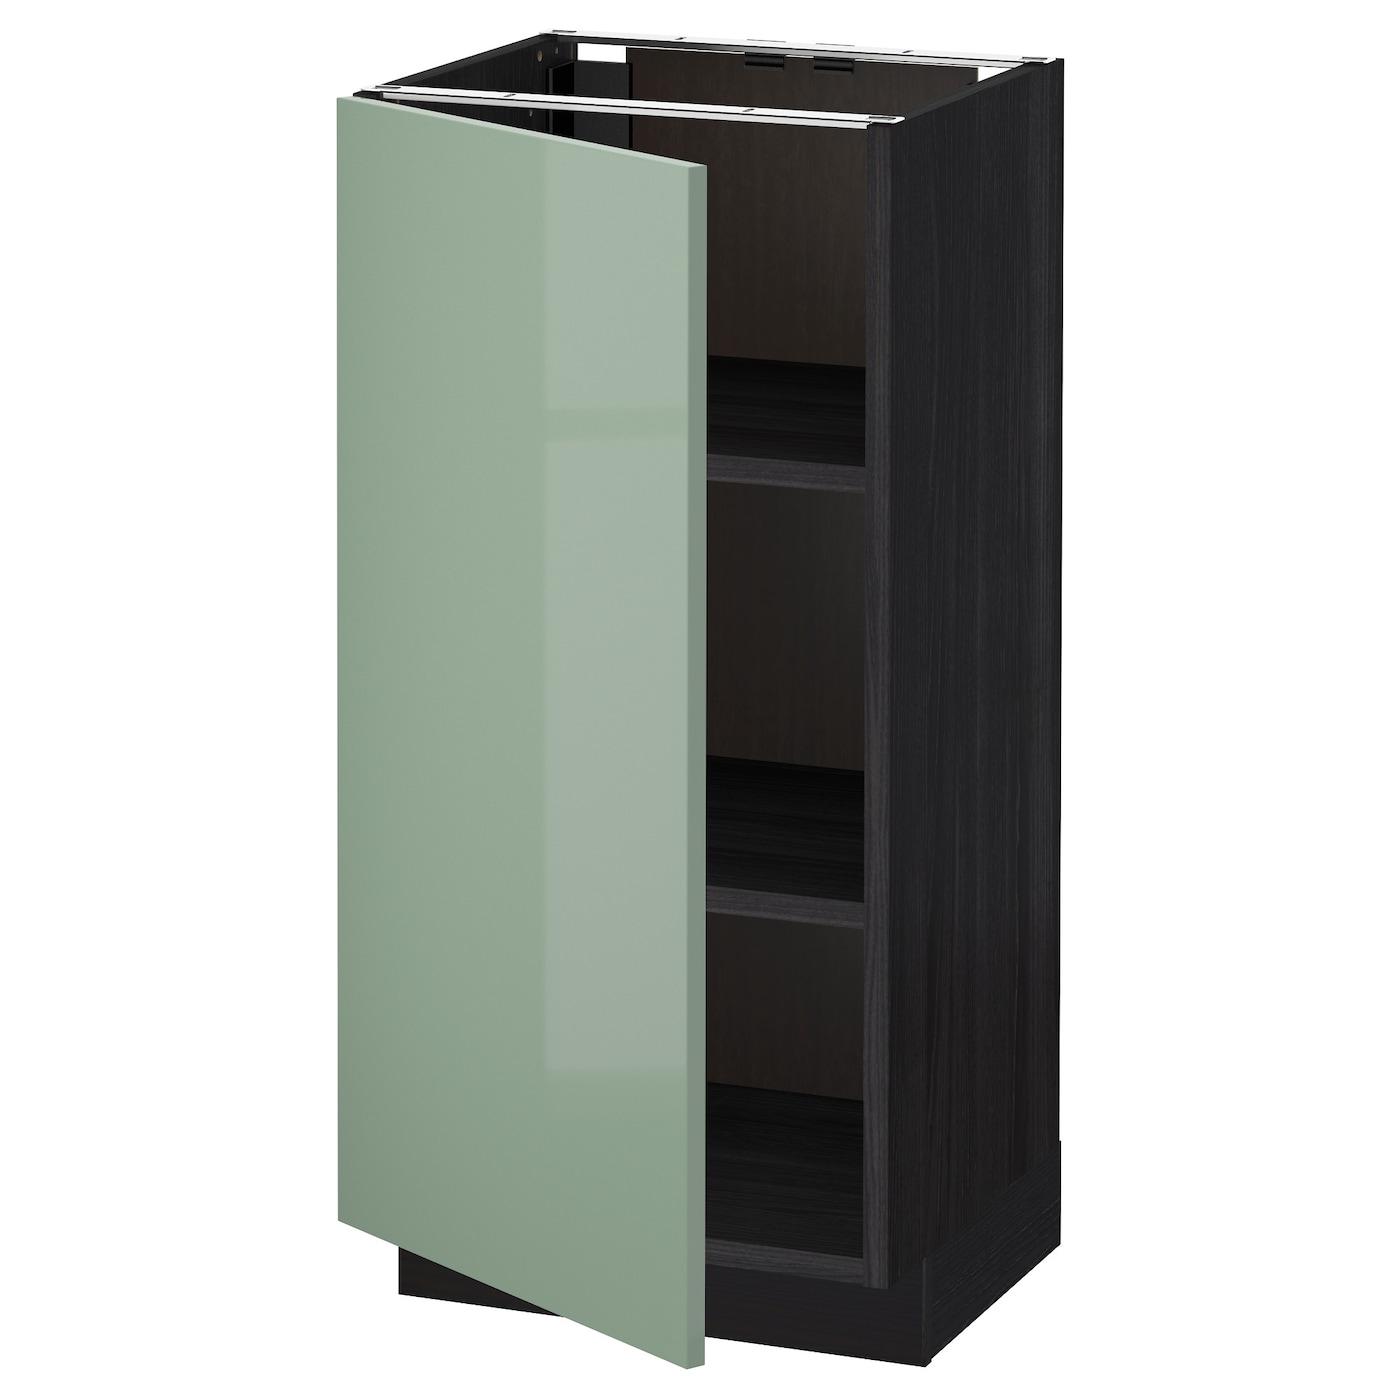 Ikea Black Kitchen Cabinets: METOD Base Cabinet With Shelves Black/kallarp Light Green